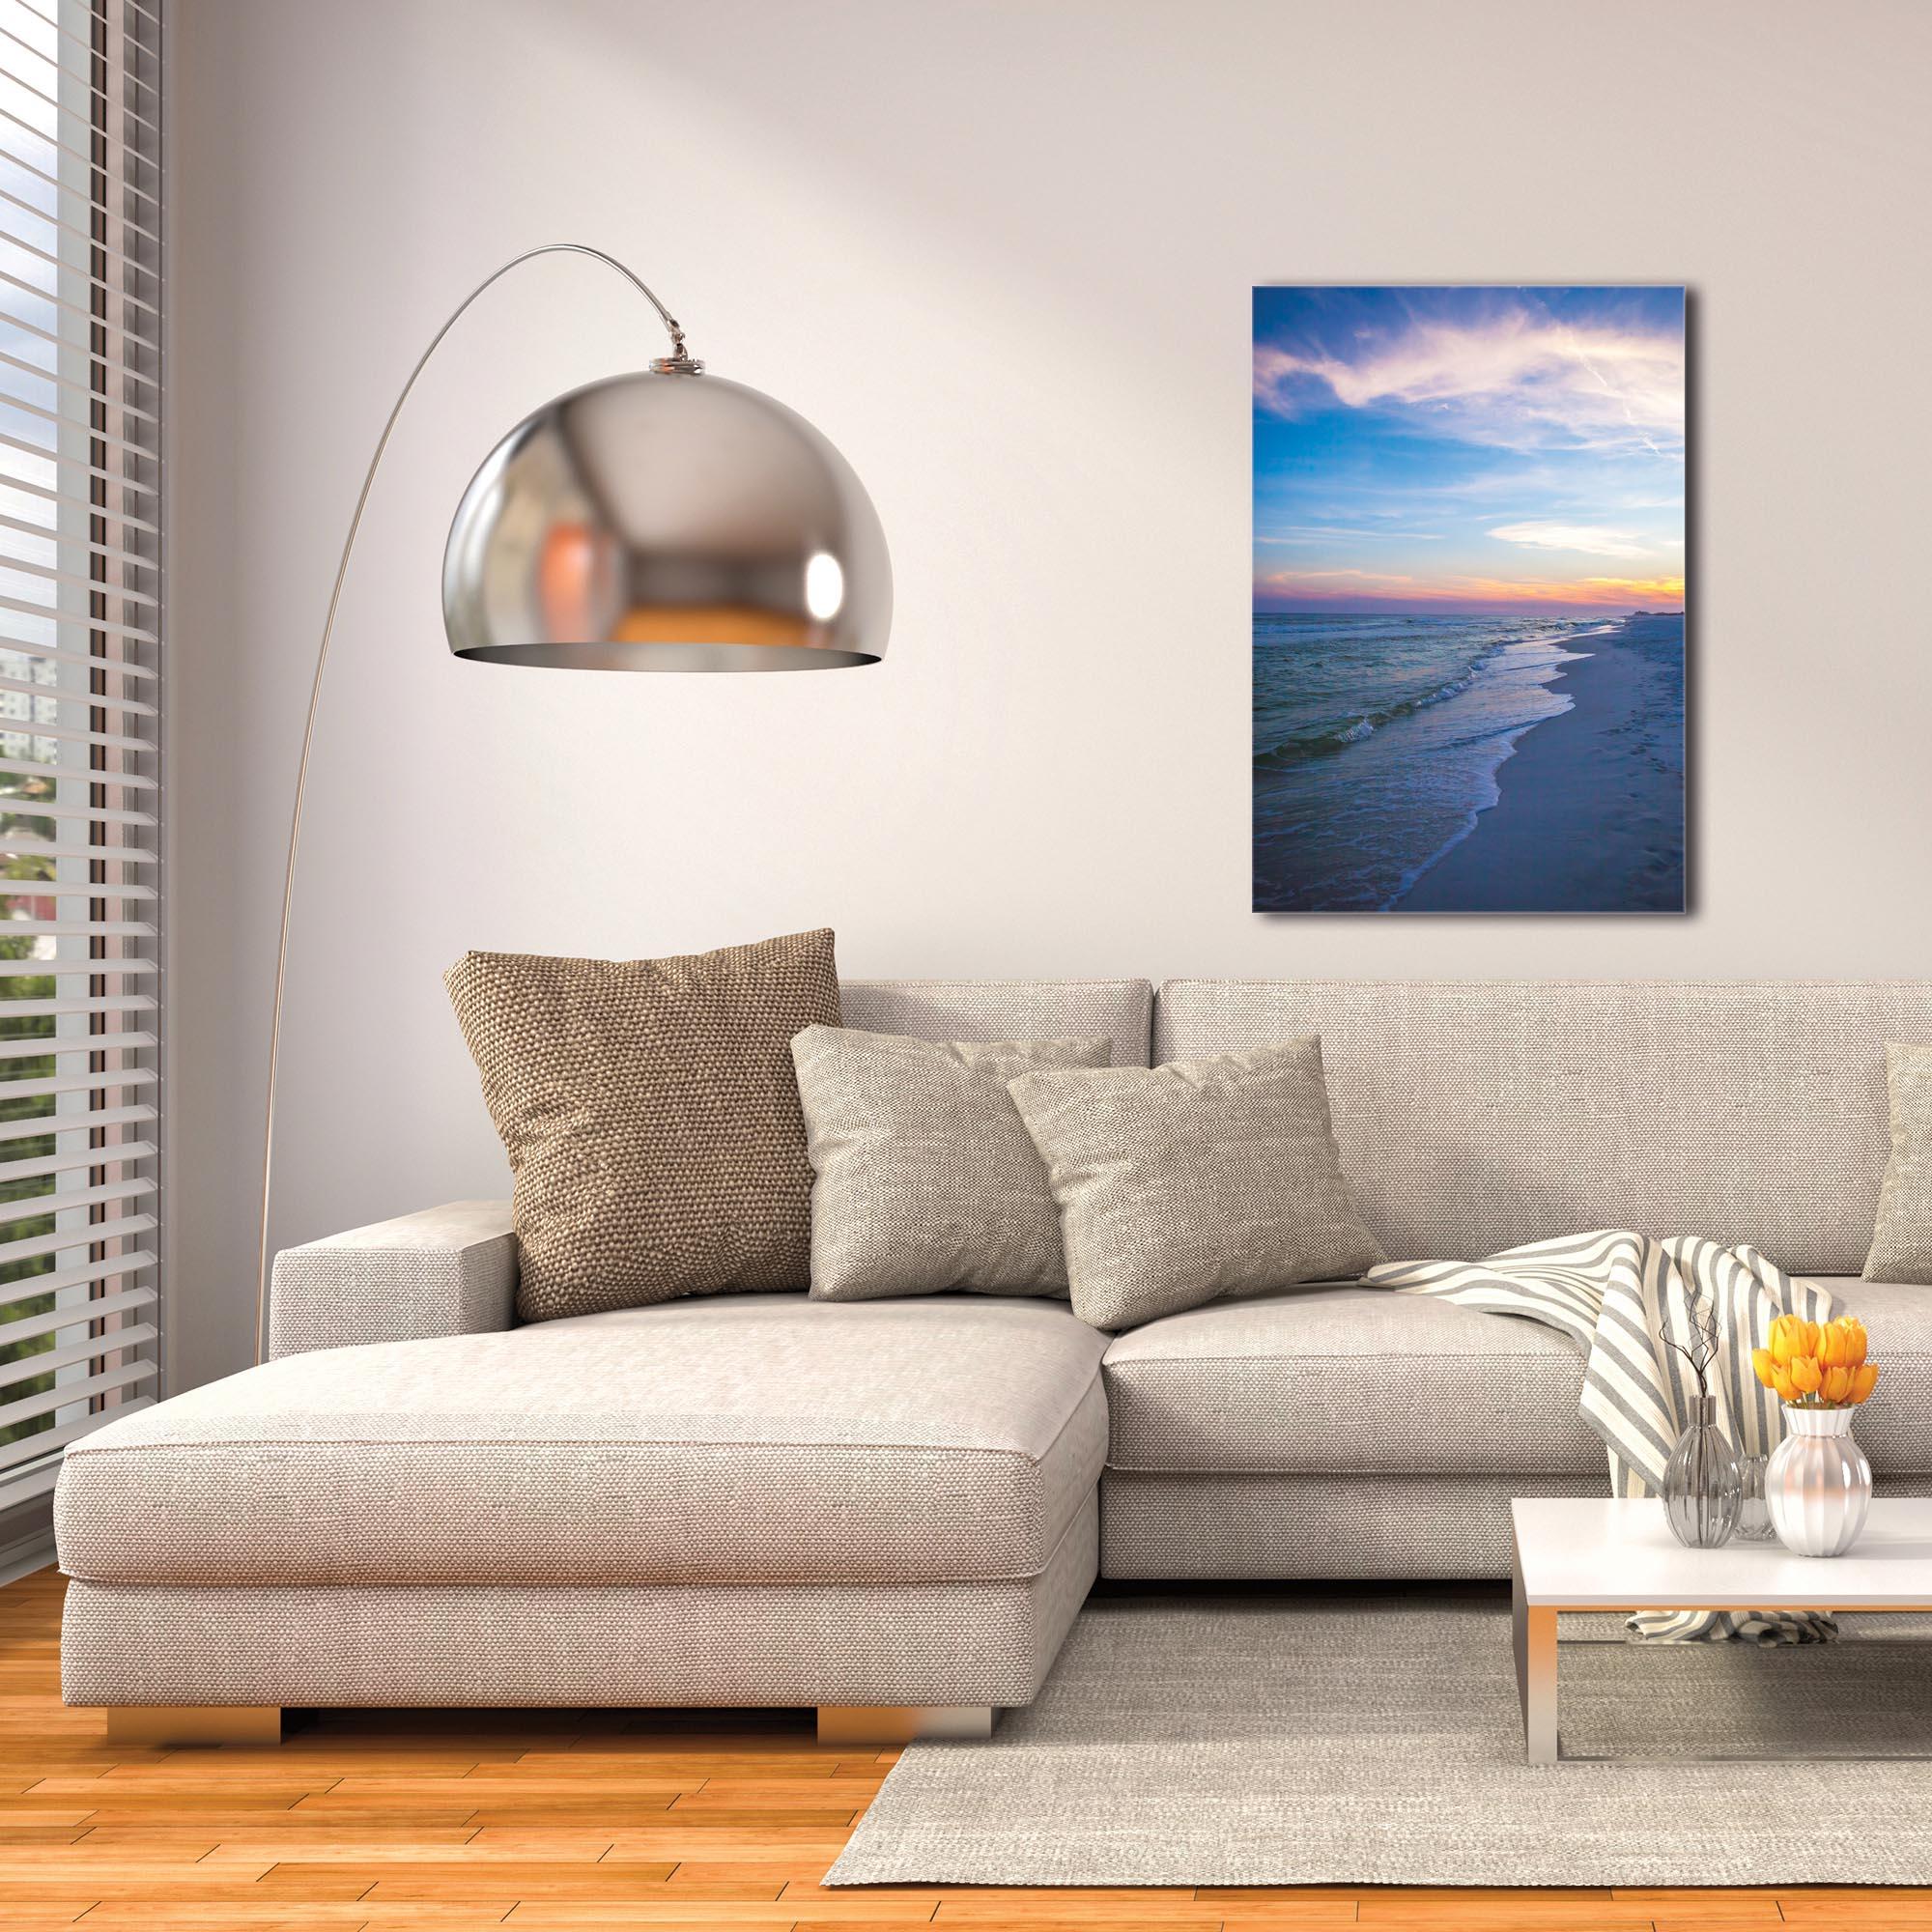 Coastal Wall Art 'Sunset Shores' - Romantic Sunset Decor on Metal or Plexiglass - Image 3